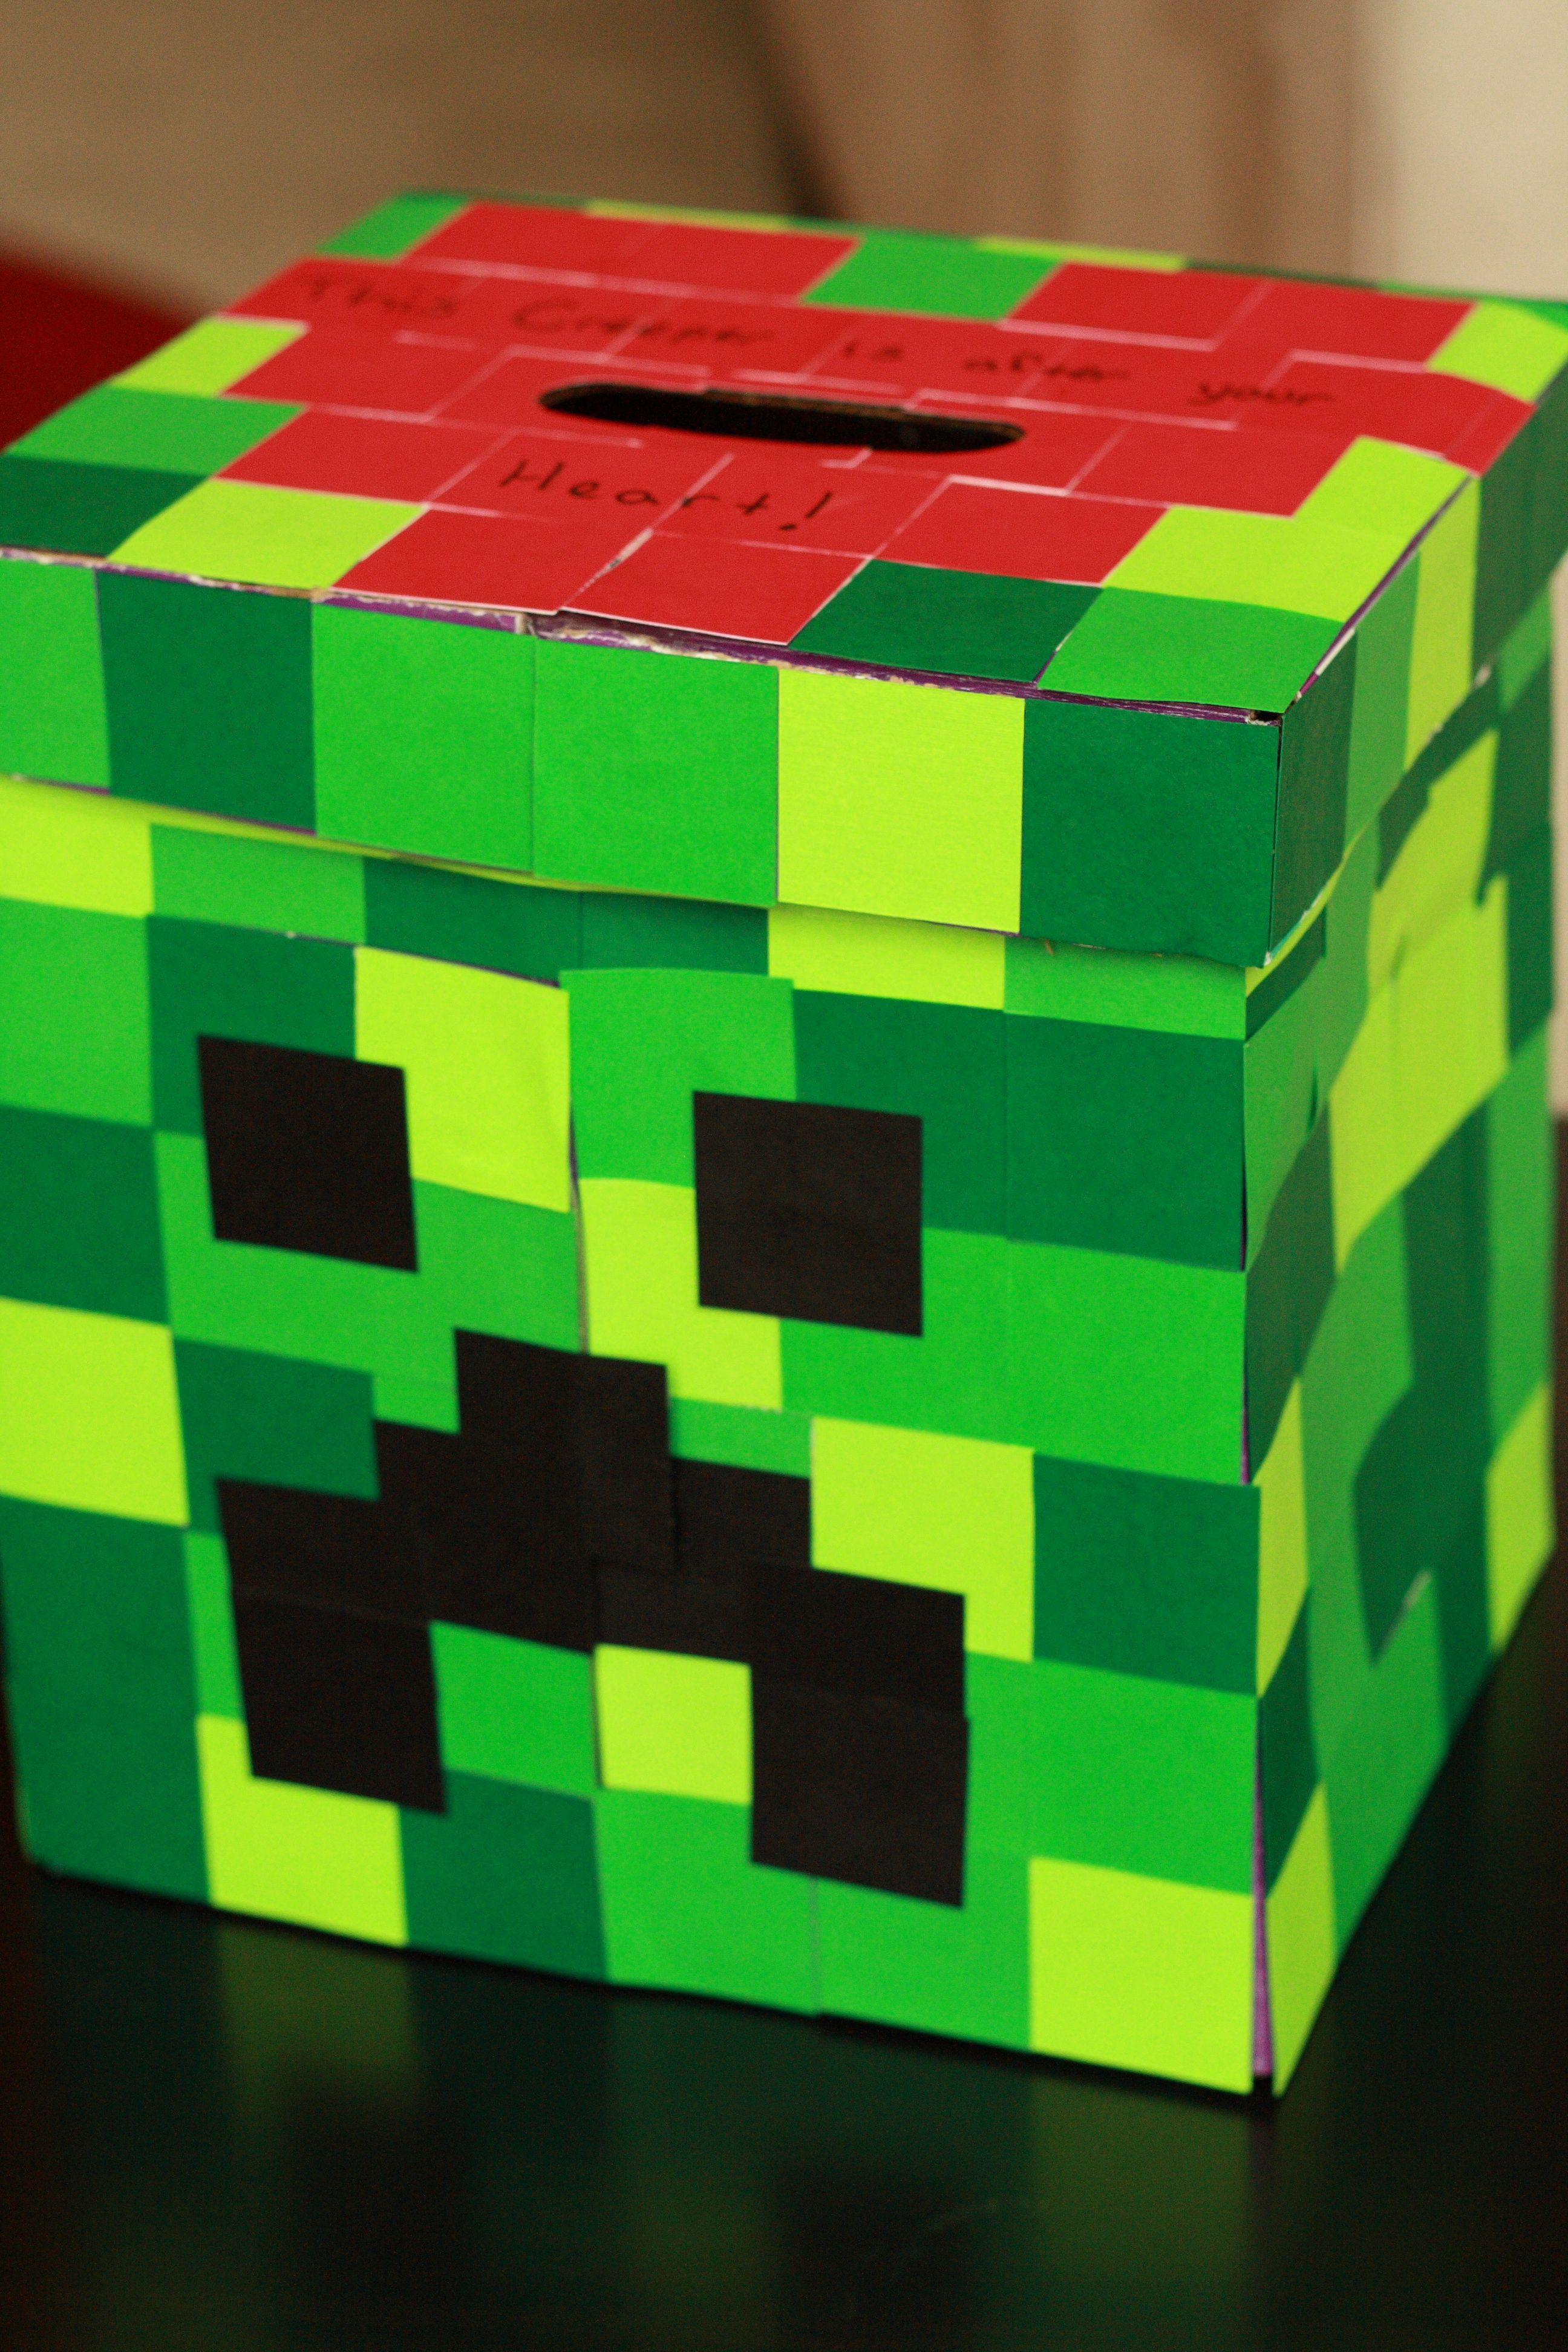 http://media-cache-ak0.pinimg.com/originals/18/f6/b8/18f6b8a58818c0eb2aea30ddf5441828.jpg